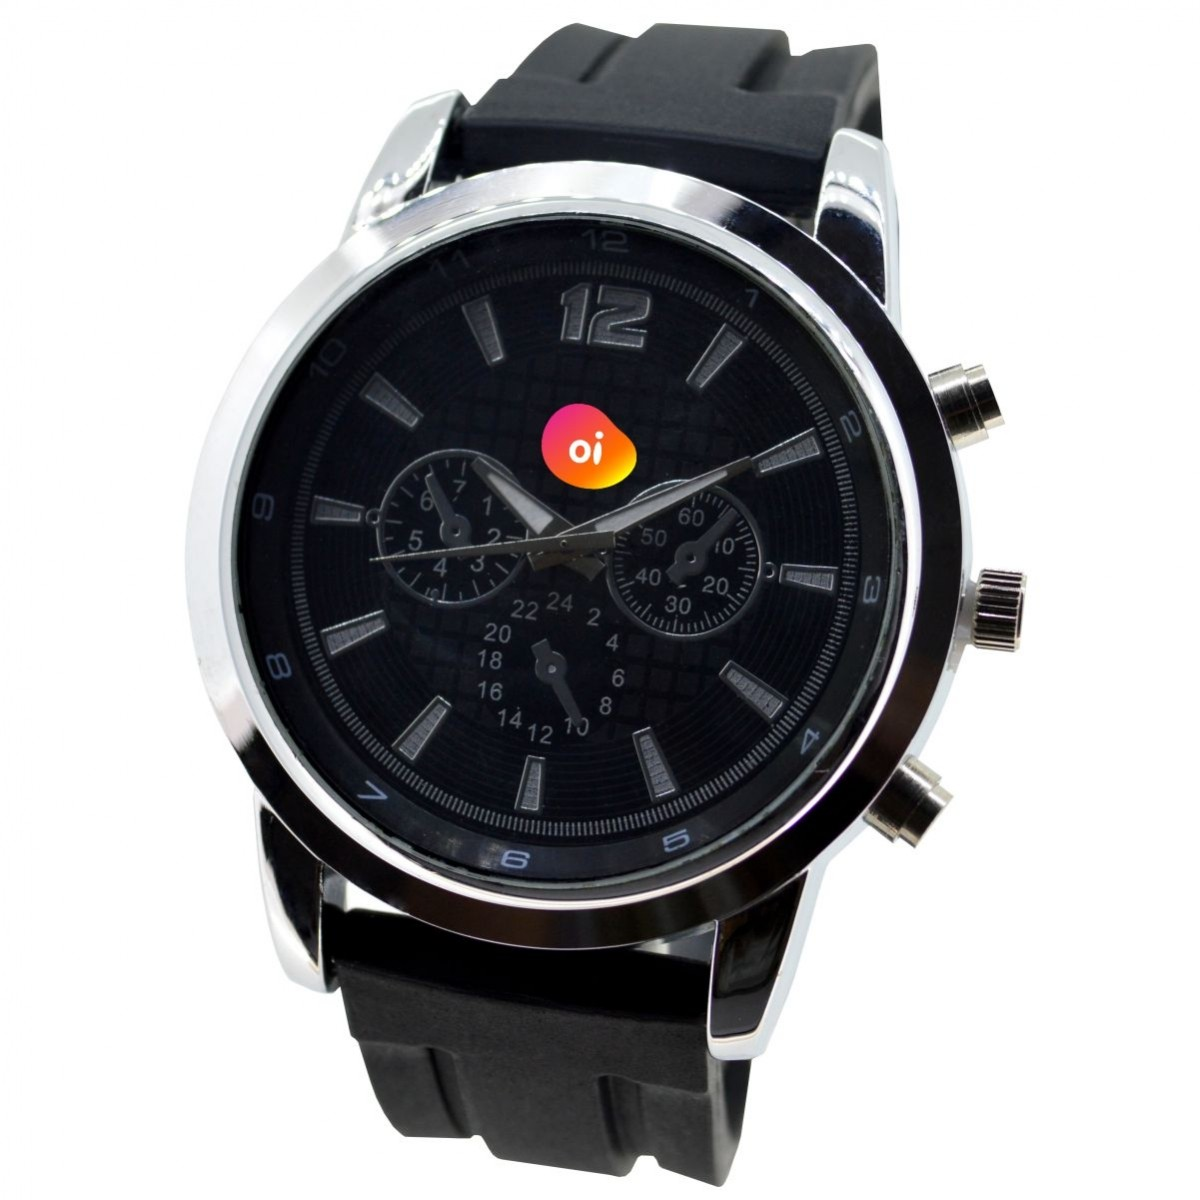 Relógio Personalizado 2477-1